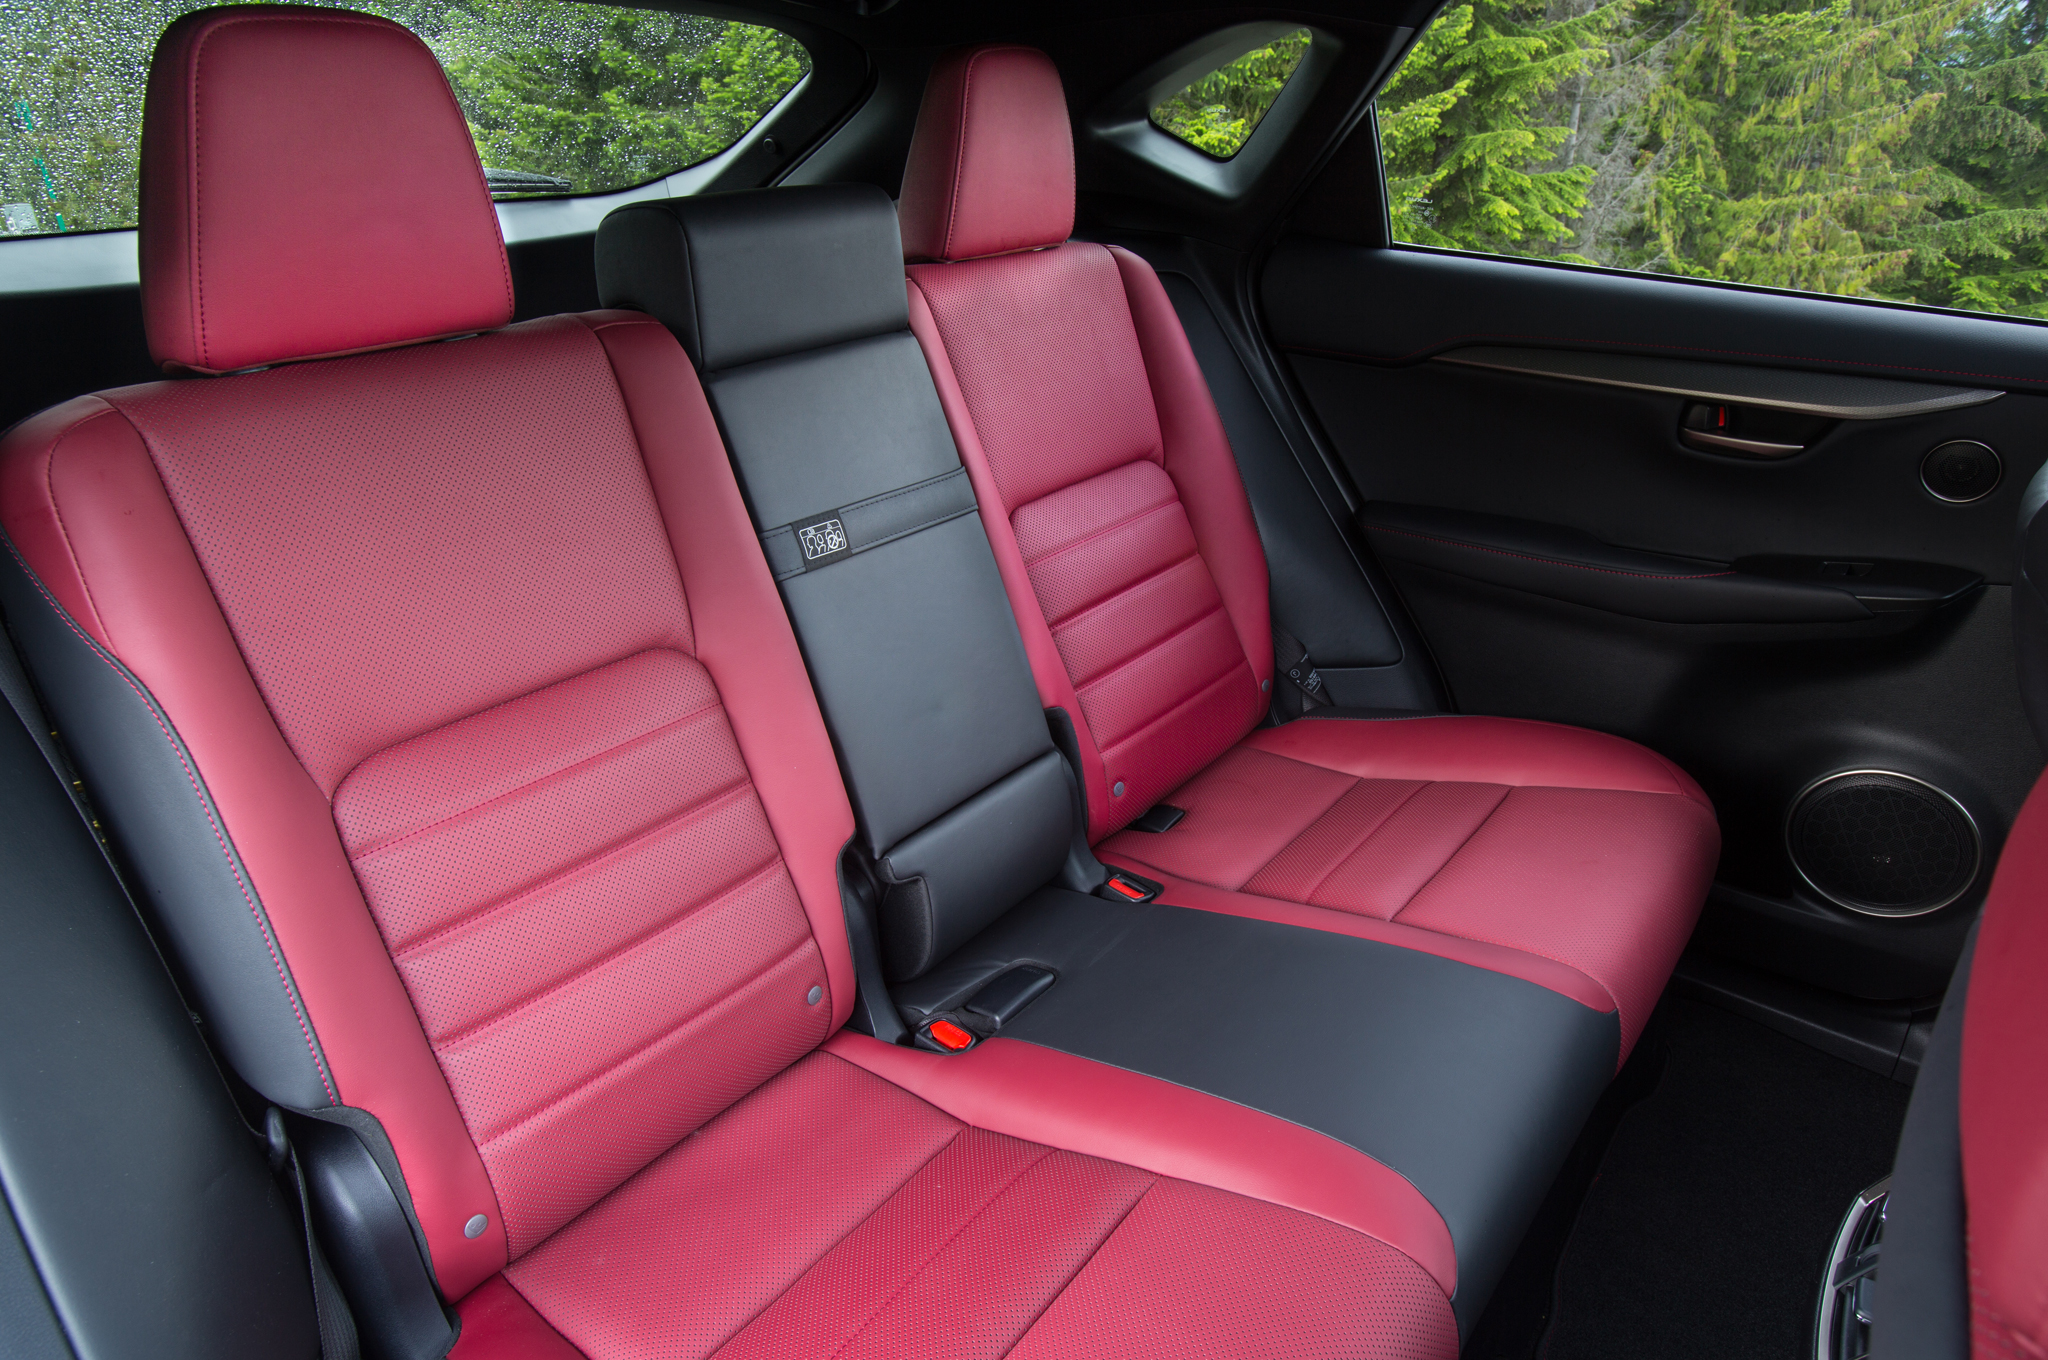 2015 Lexus NX 200T Rear Seats Design